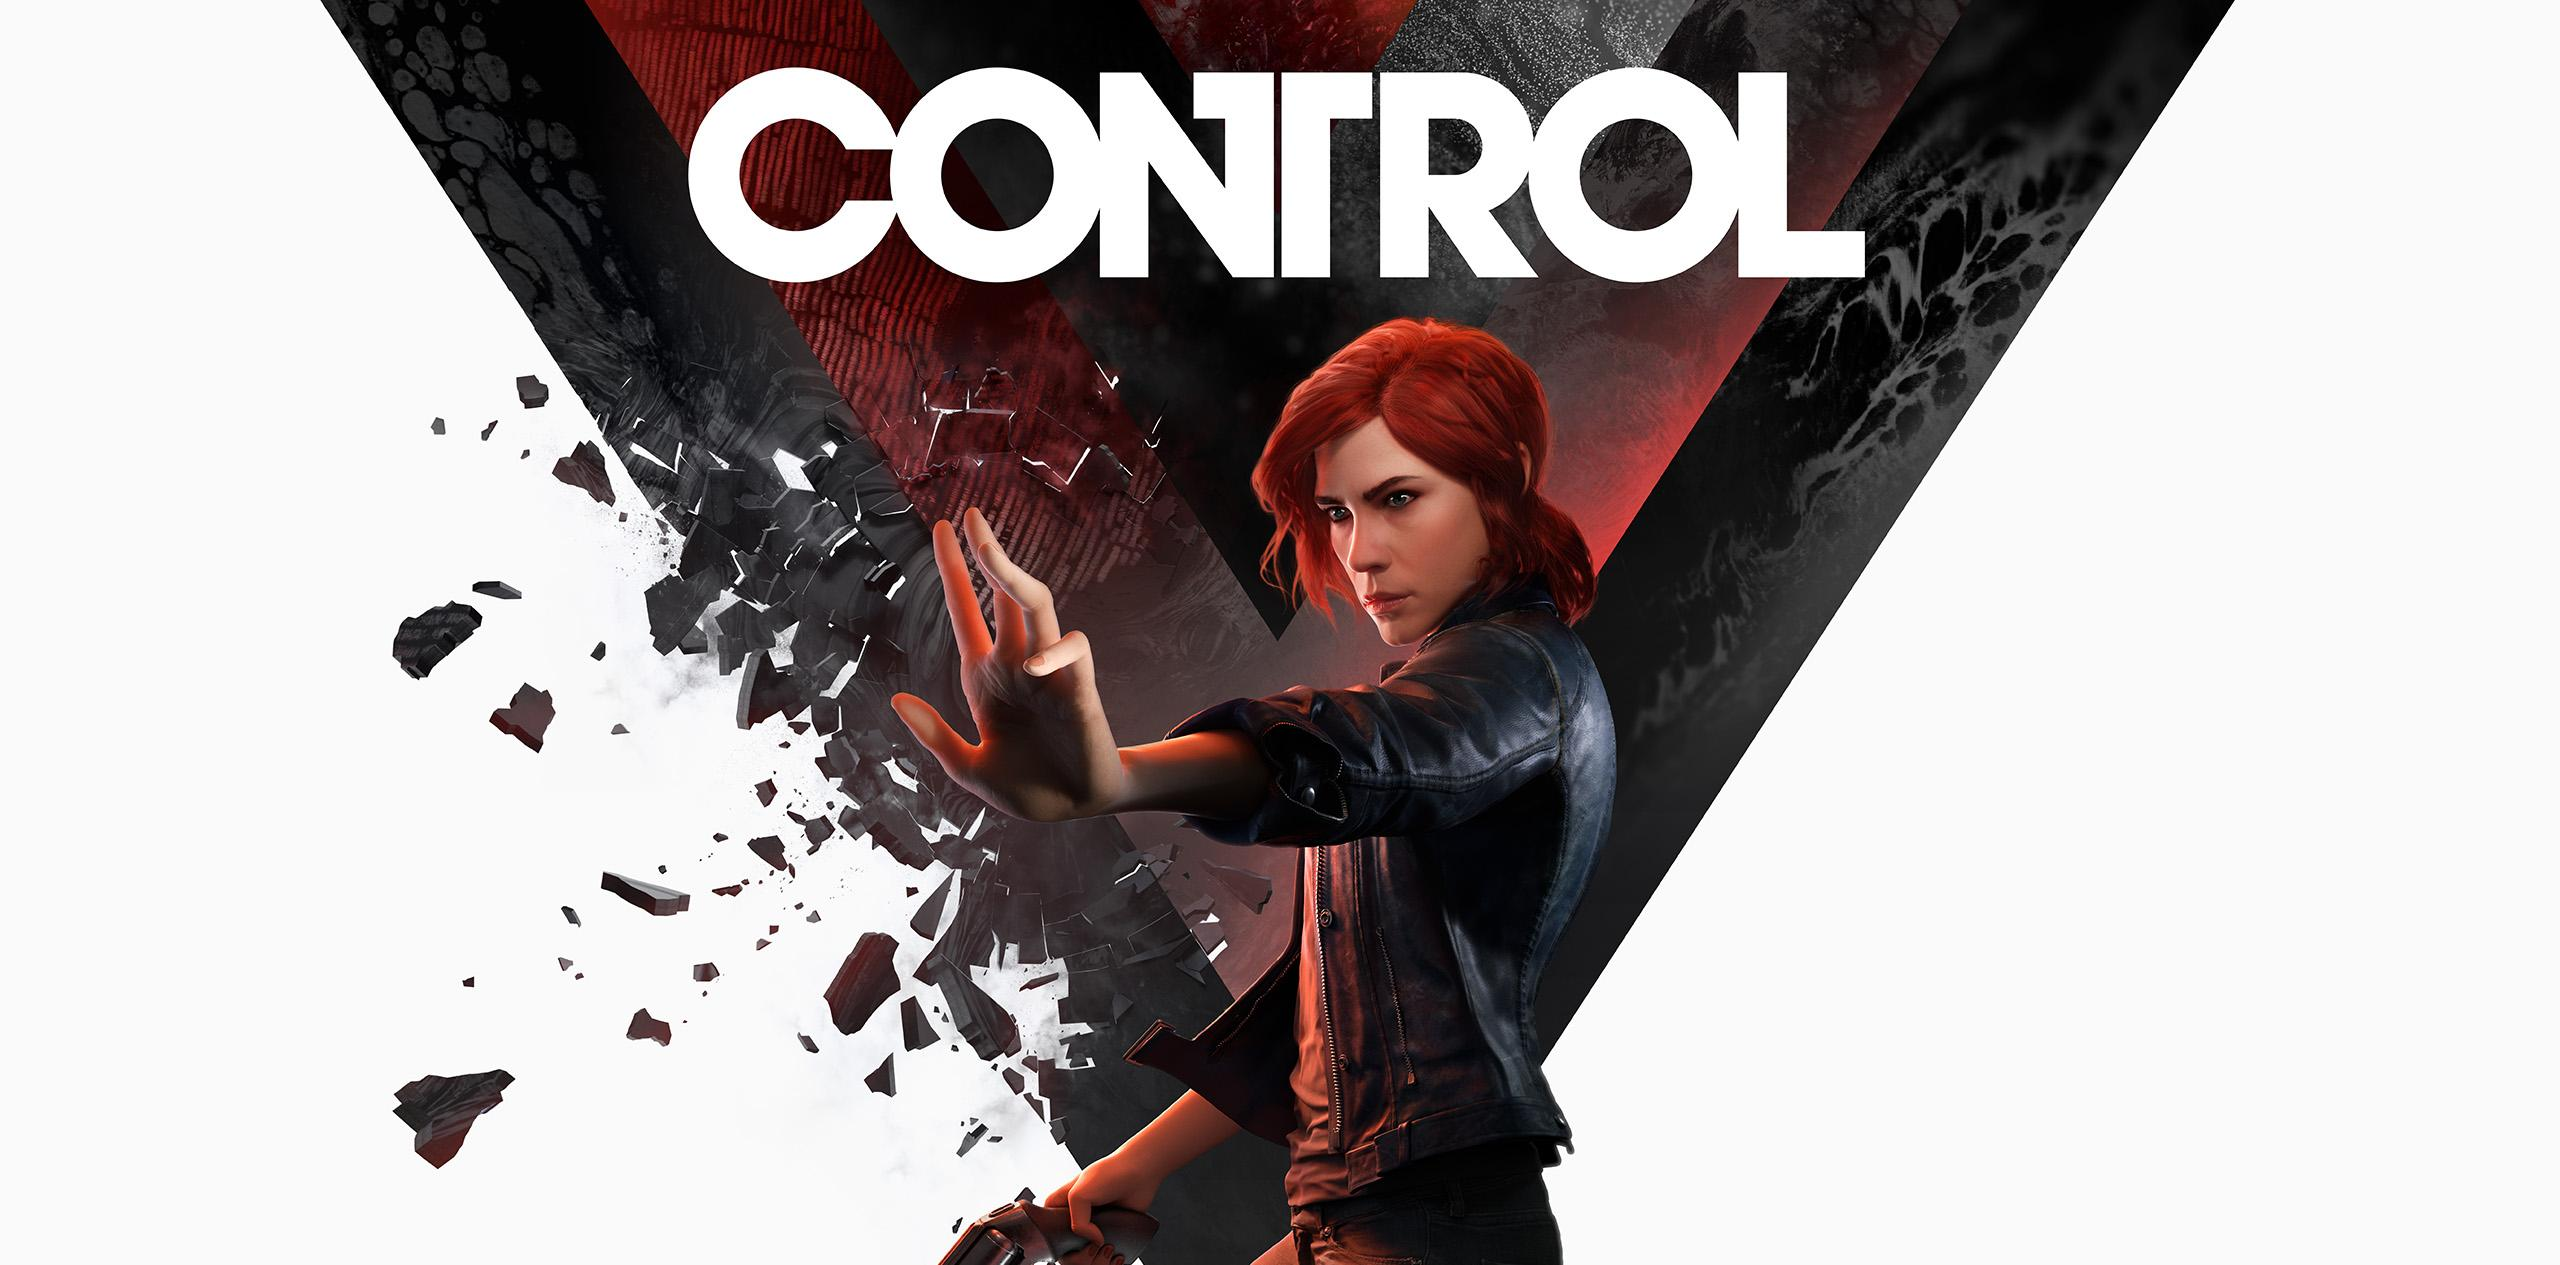 《Control》3DM评测8.6分:超能力与射爆无缝衔接 Remedy风味十足